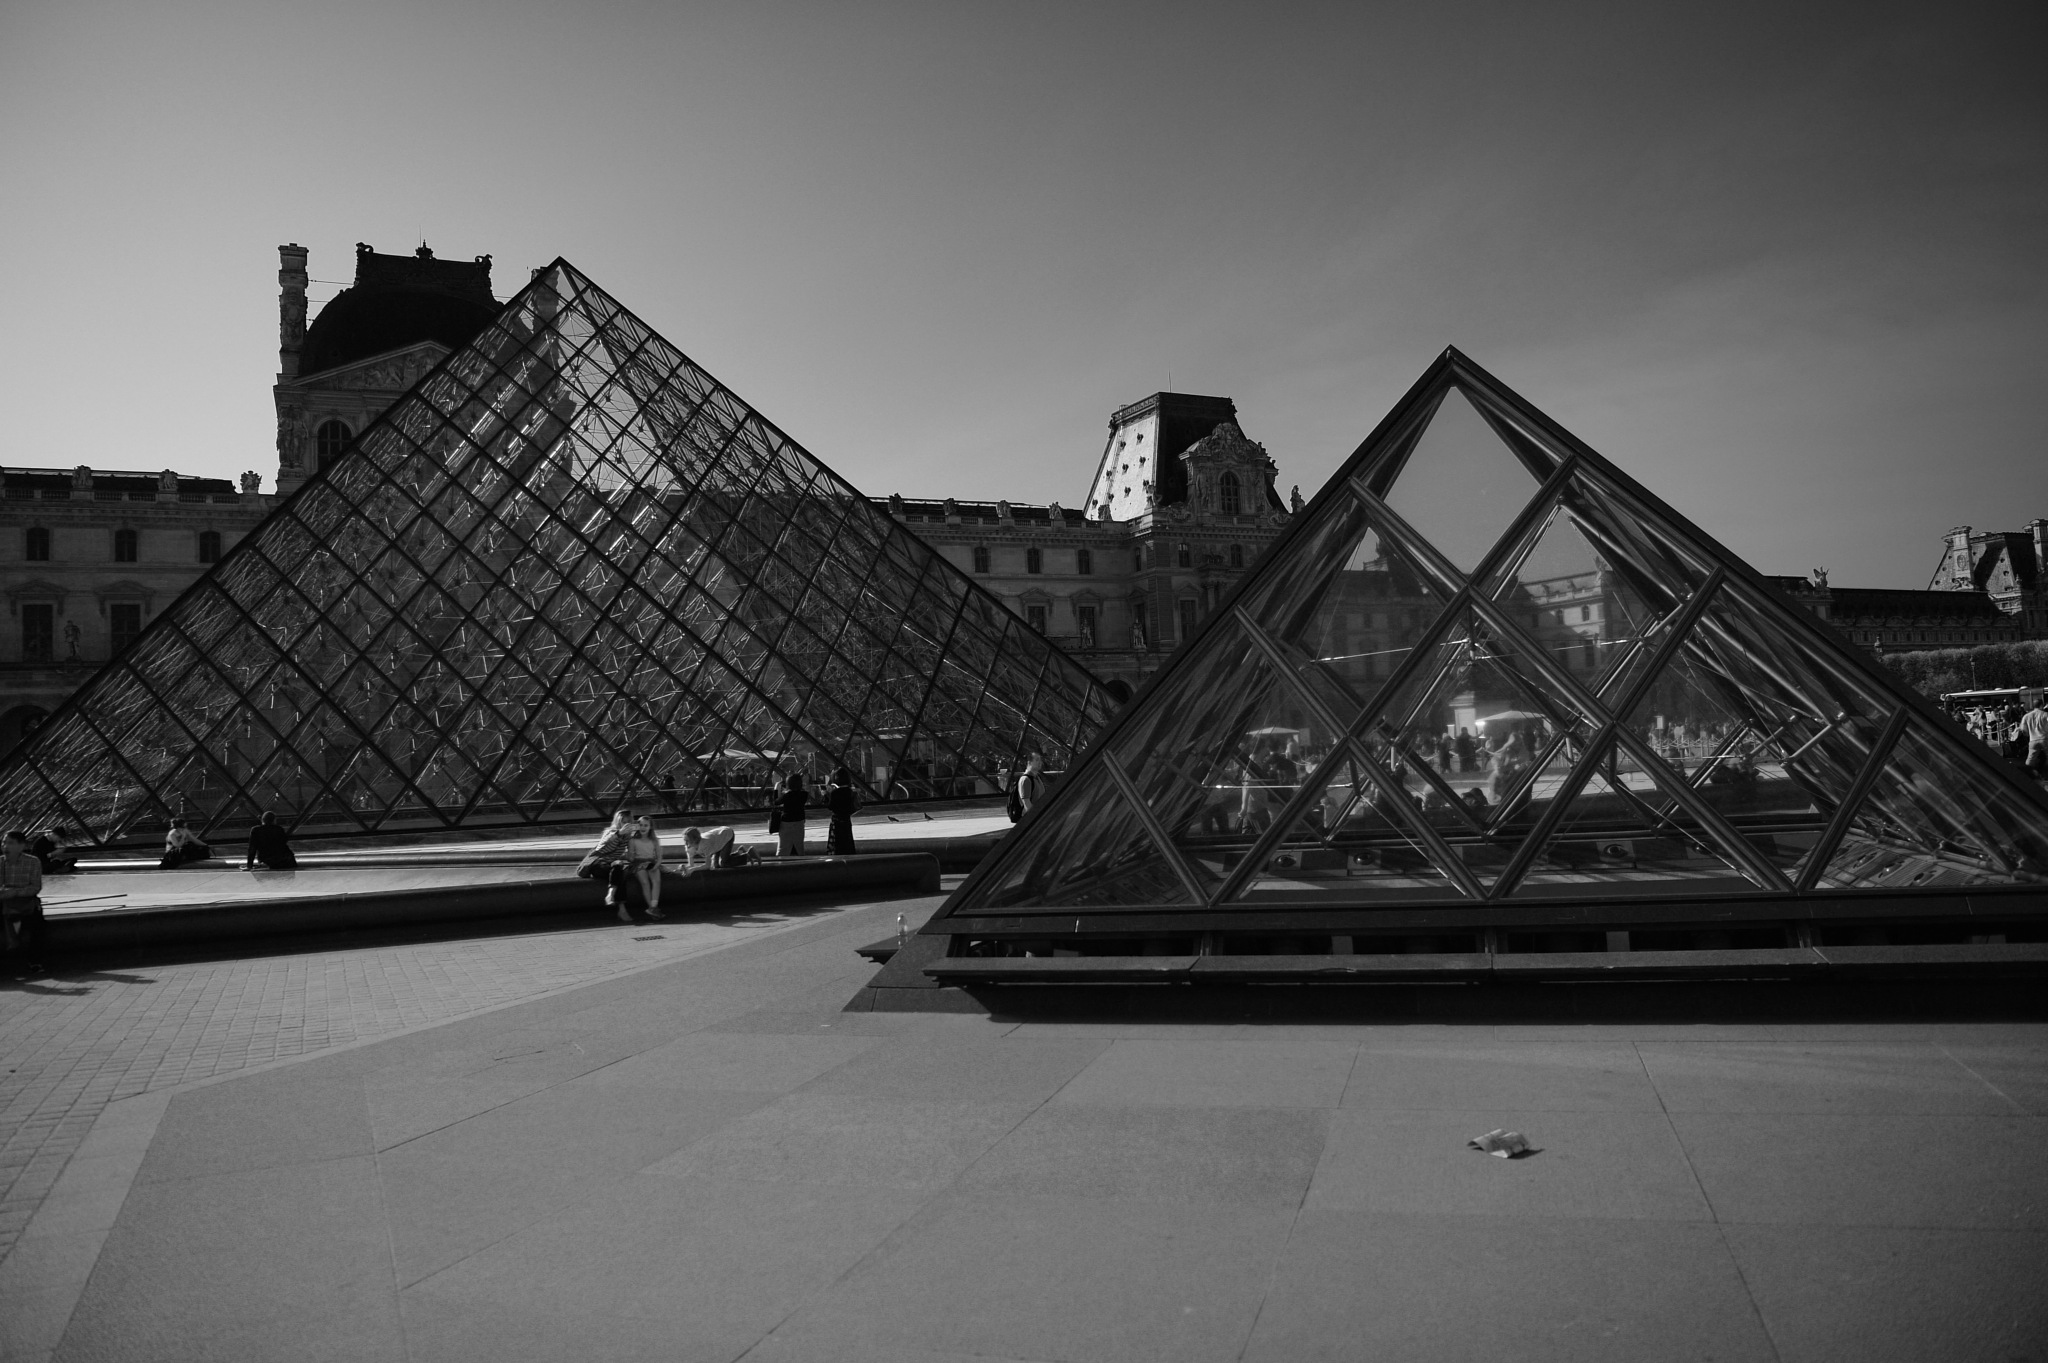 Paris, Tuilières 2018 by Robert Malin Young